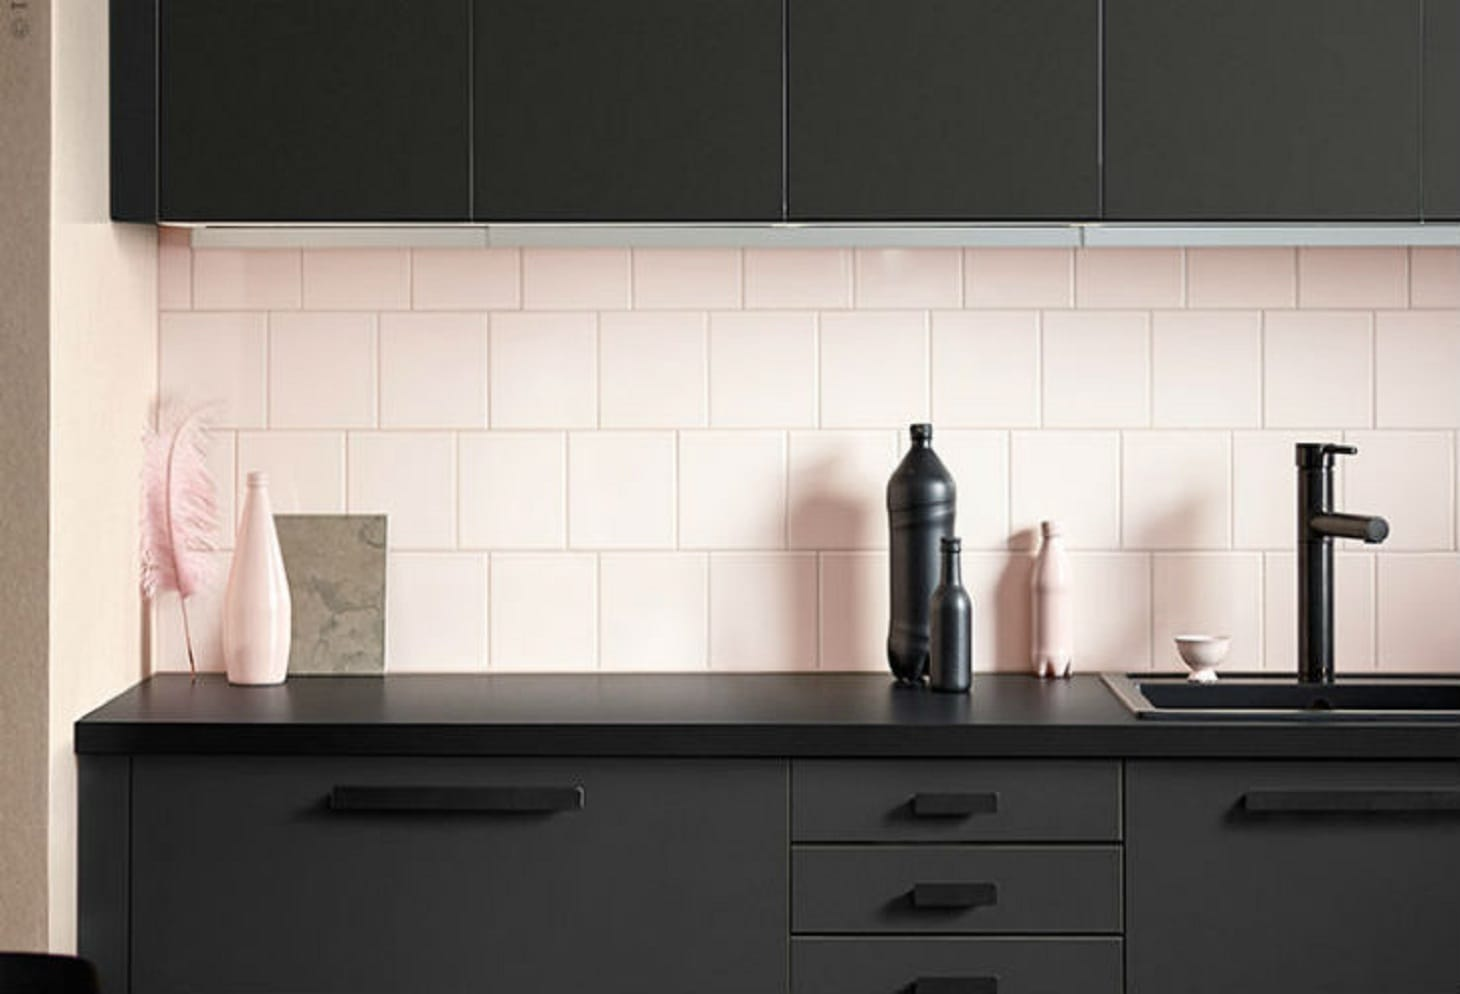 kungsbacka la cucina in plastica riciclata di ikea. Black Bedroom Furniture Sets. Home Design Ideas